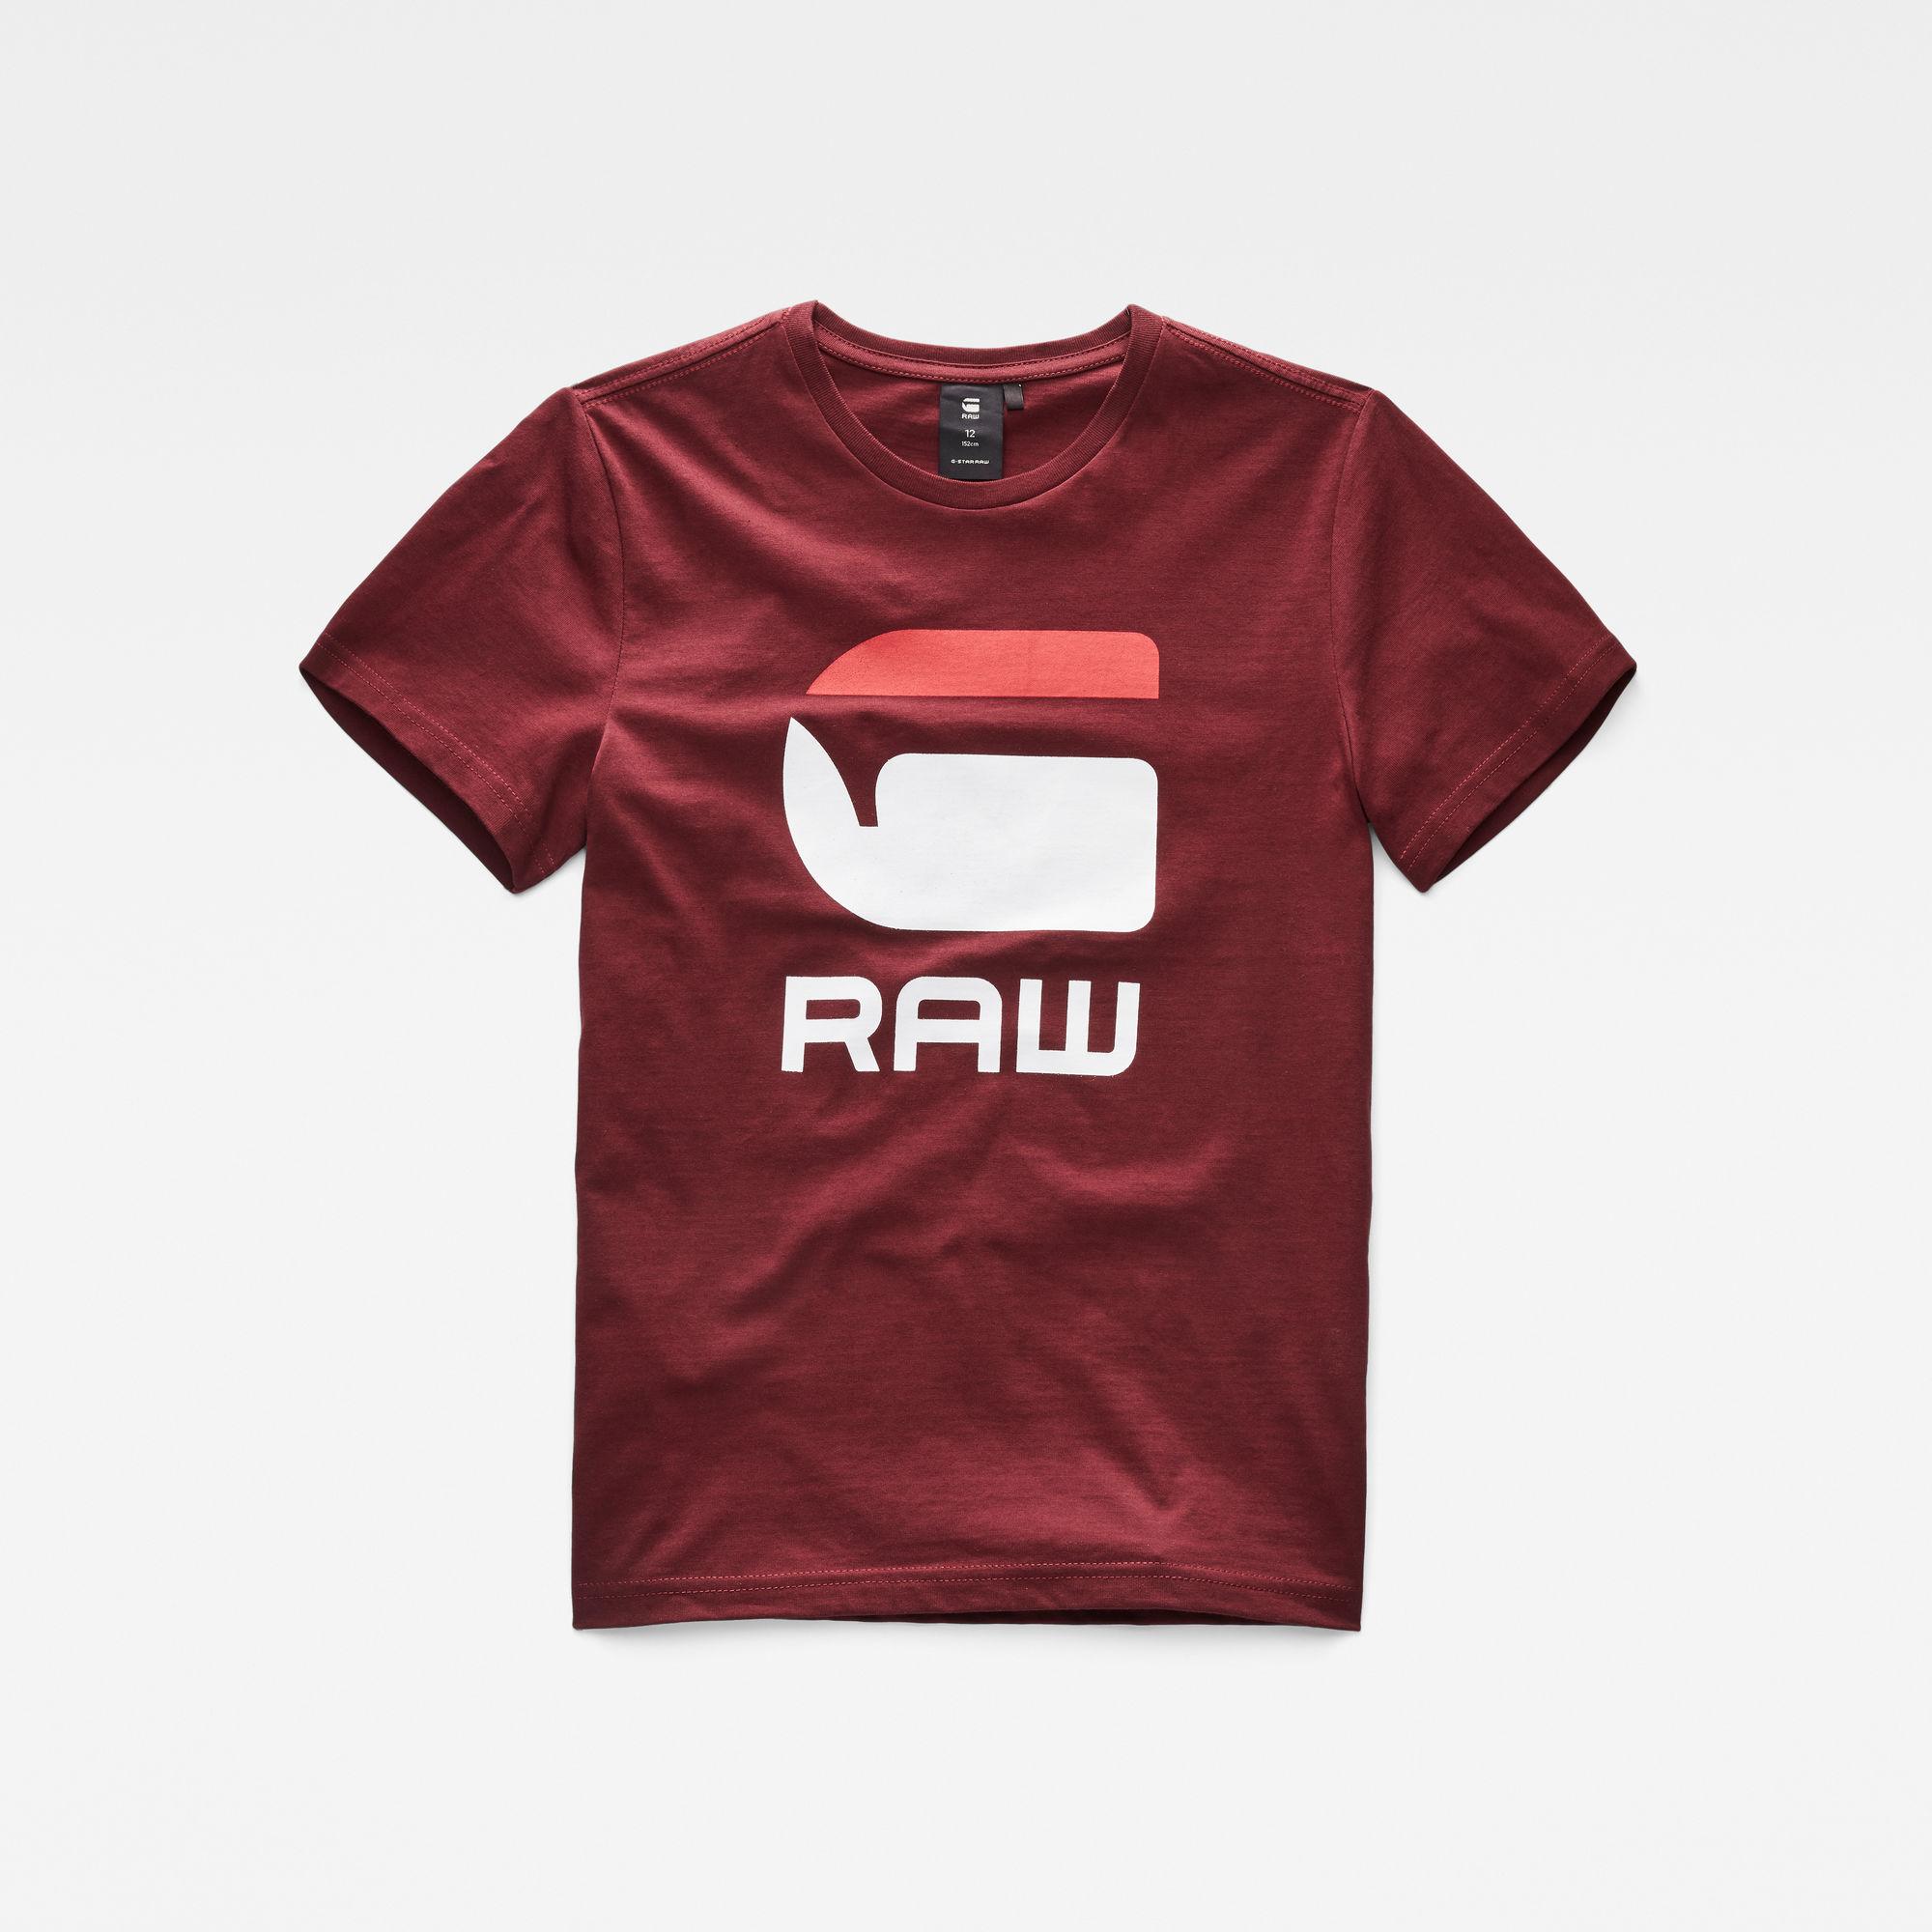 G-Star RAW Jongens T-shirt Rood